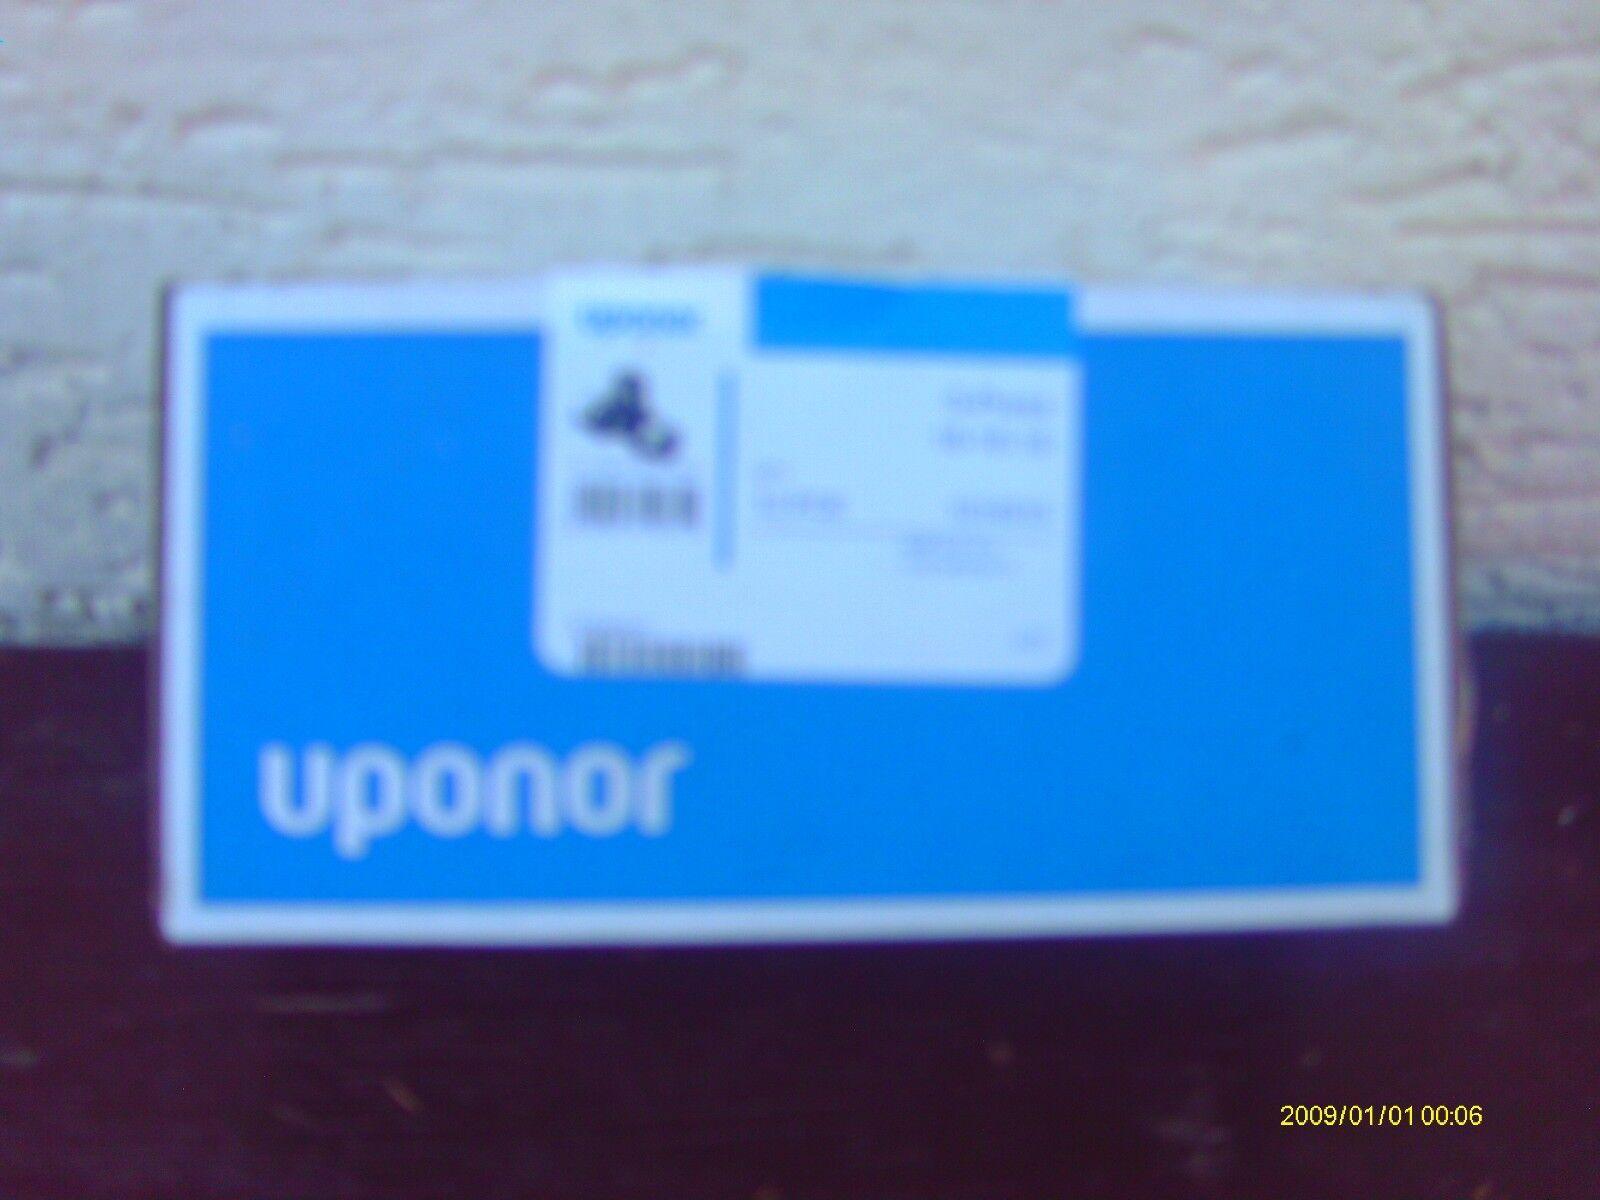 Pressfittinge Uponor, Unipipe  Unicor MLC Bögen 16 mm